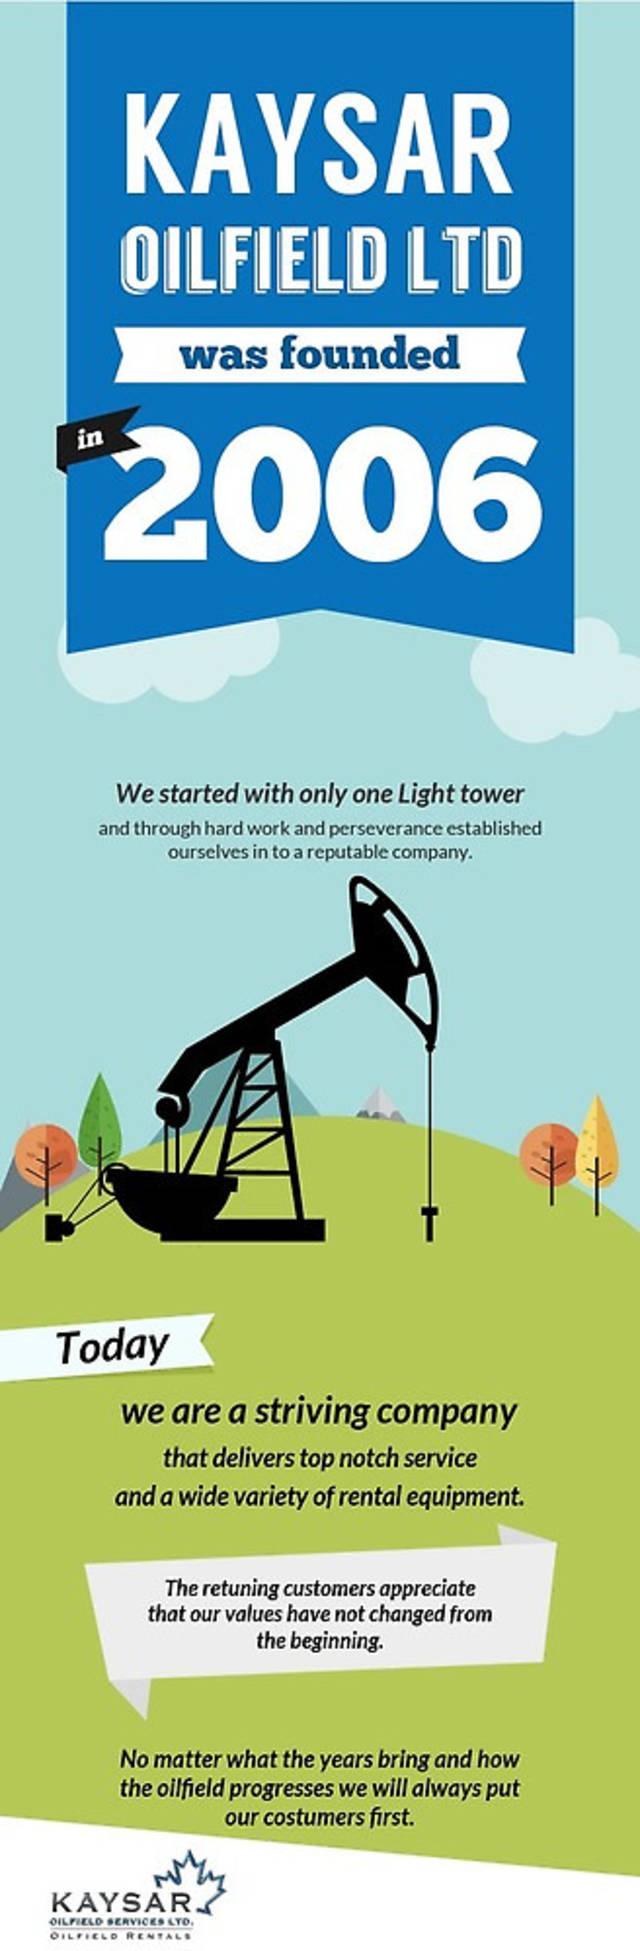 Kaysar oilfield services ltd.   oilfield rental equipment company in ontario